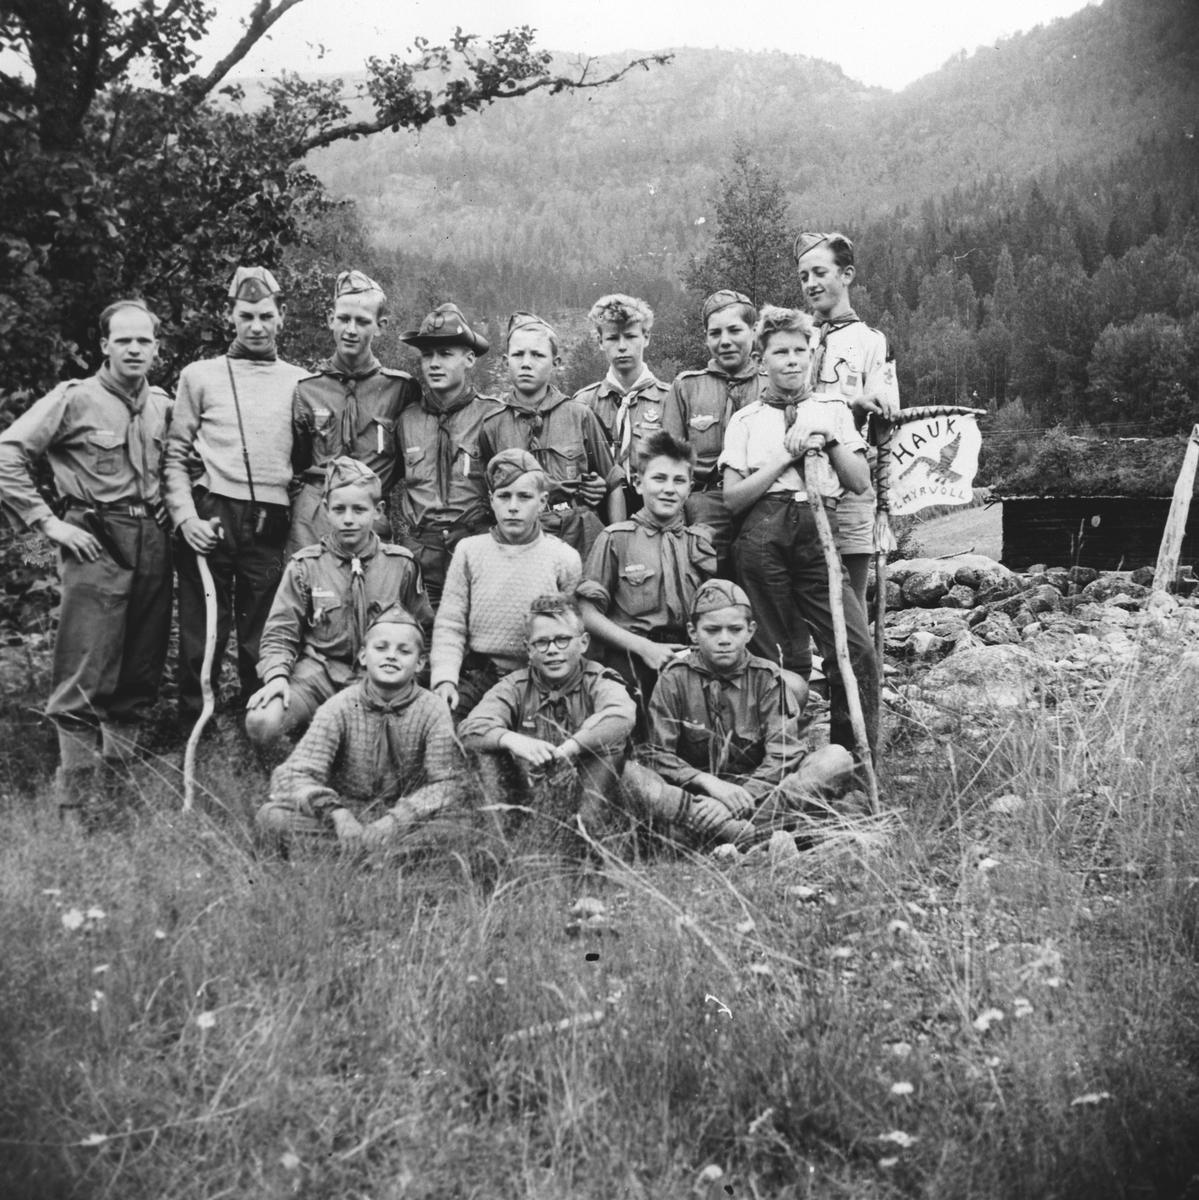 1. Myrvoll på vandretur via: Fyrrsdal, Tovdal, Hynnekleiv, Hjem